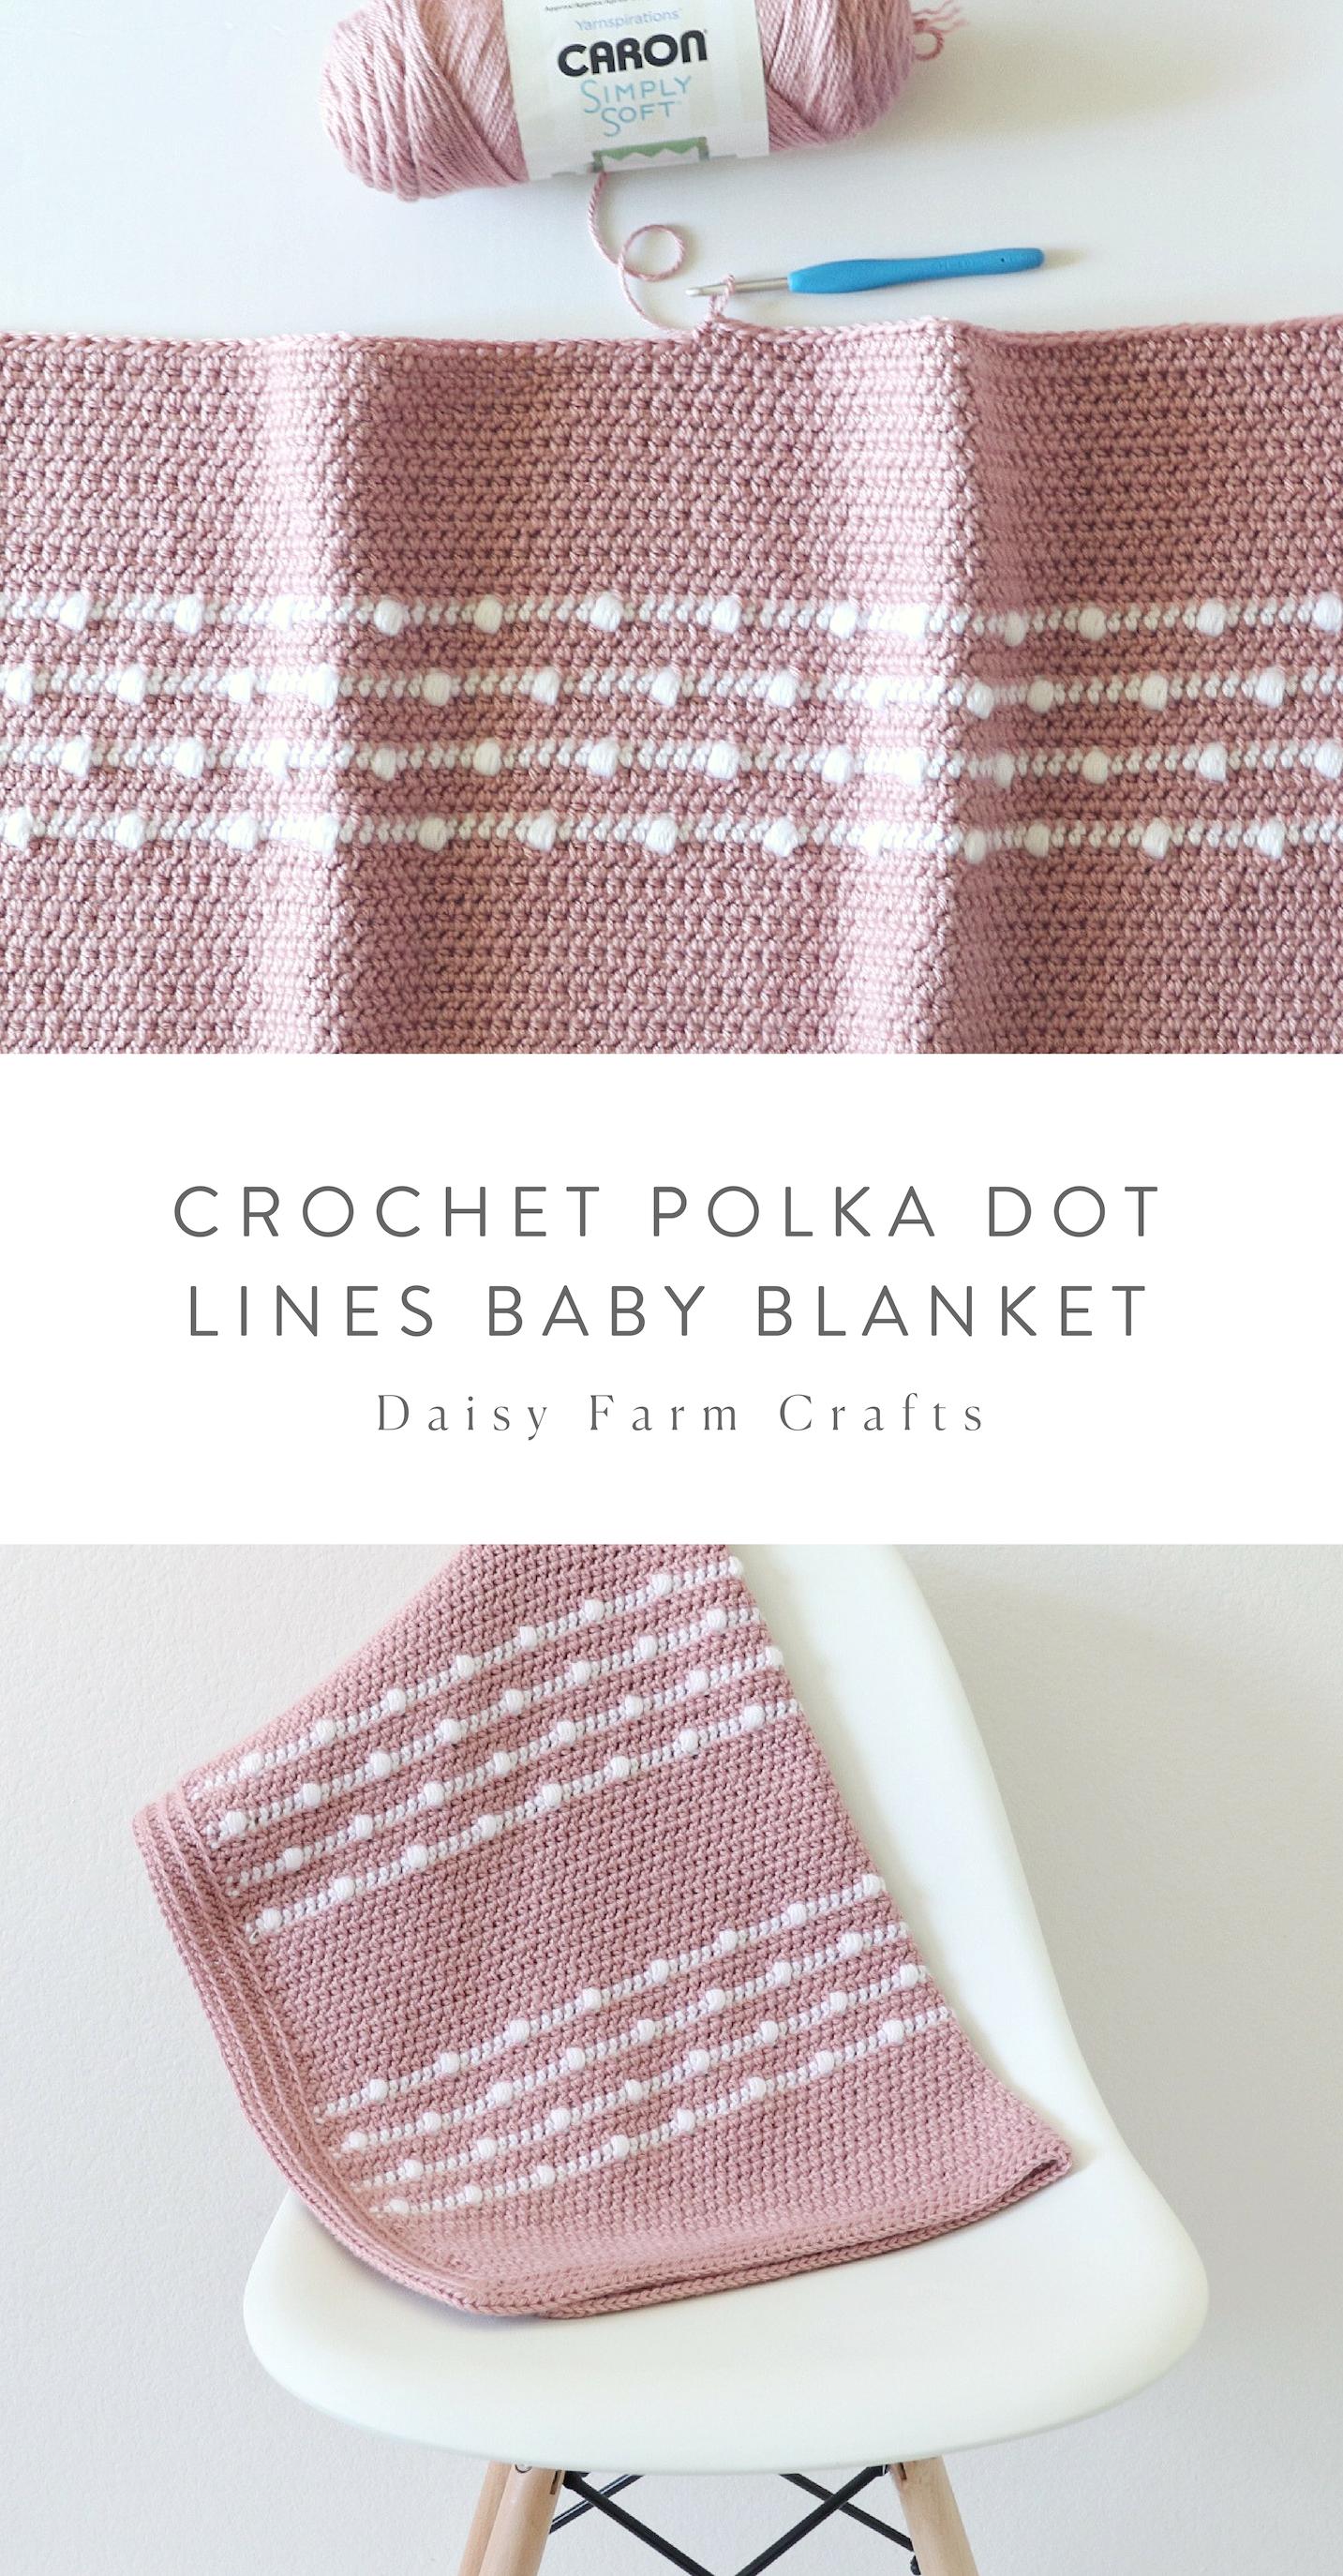 Free Pattern - Crochet Polka Dot Lines Baby Blanket #babyblanket